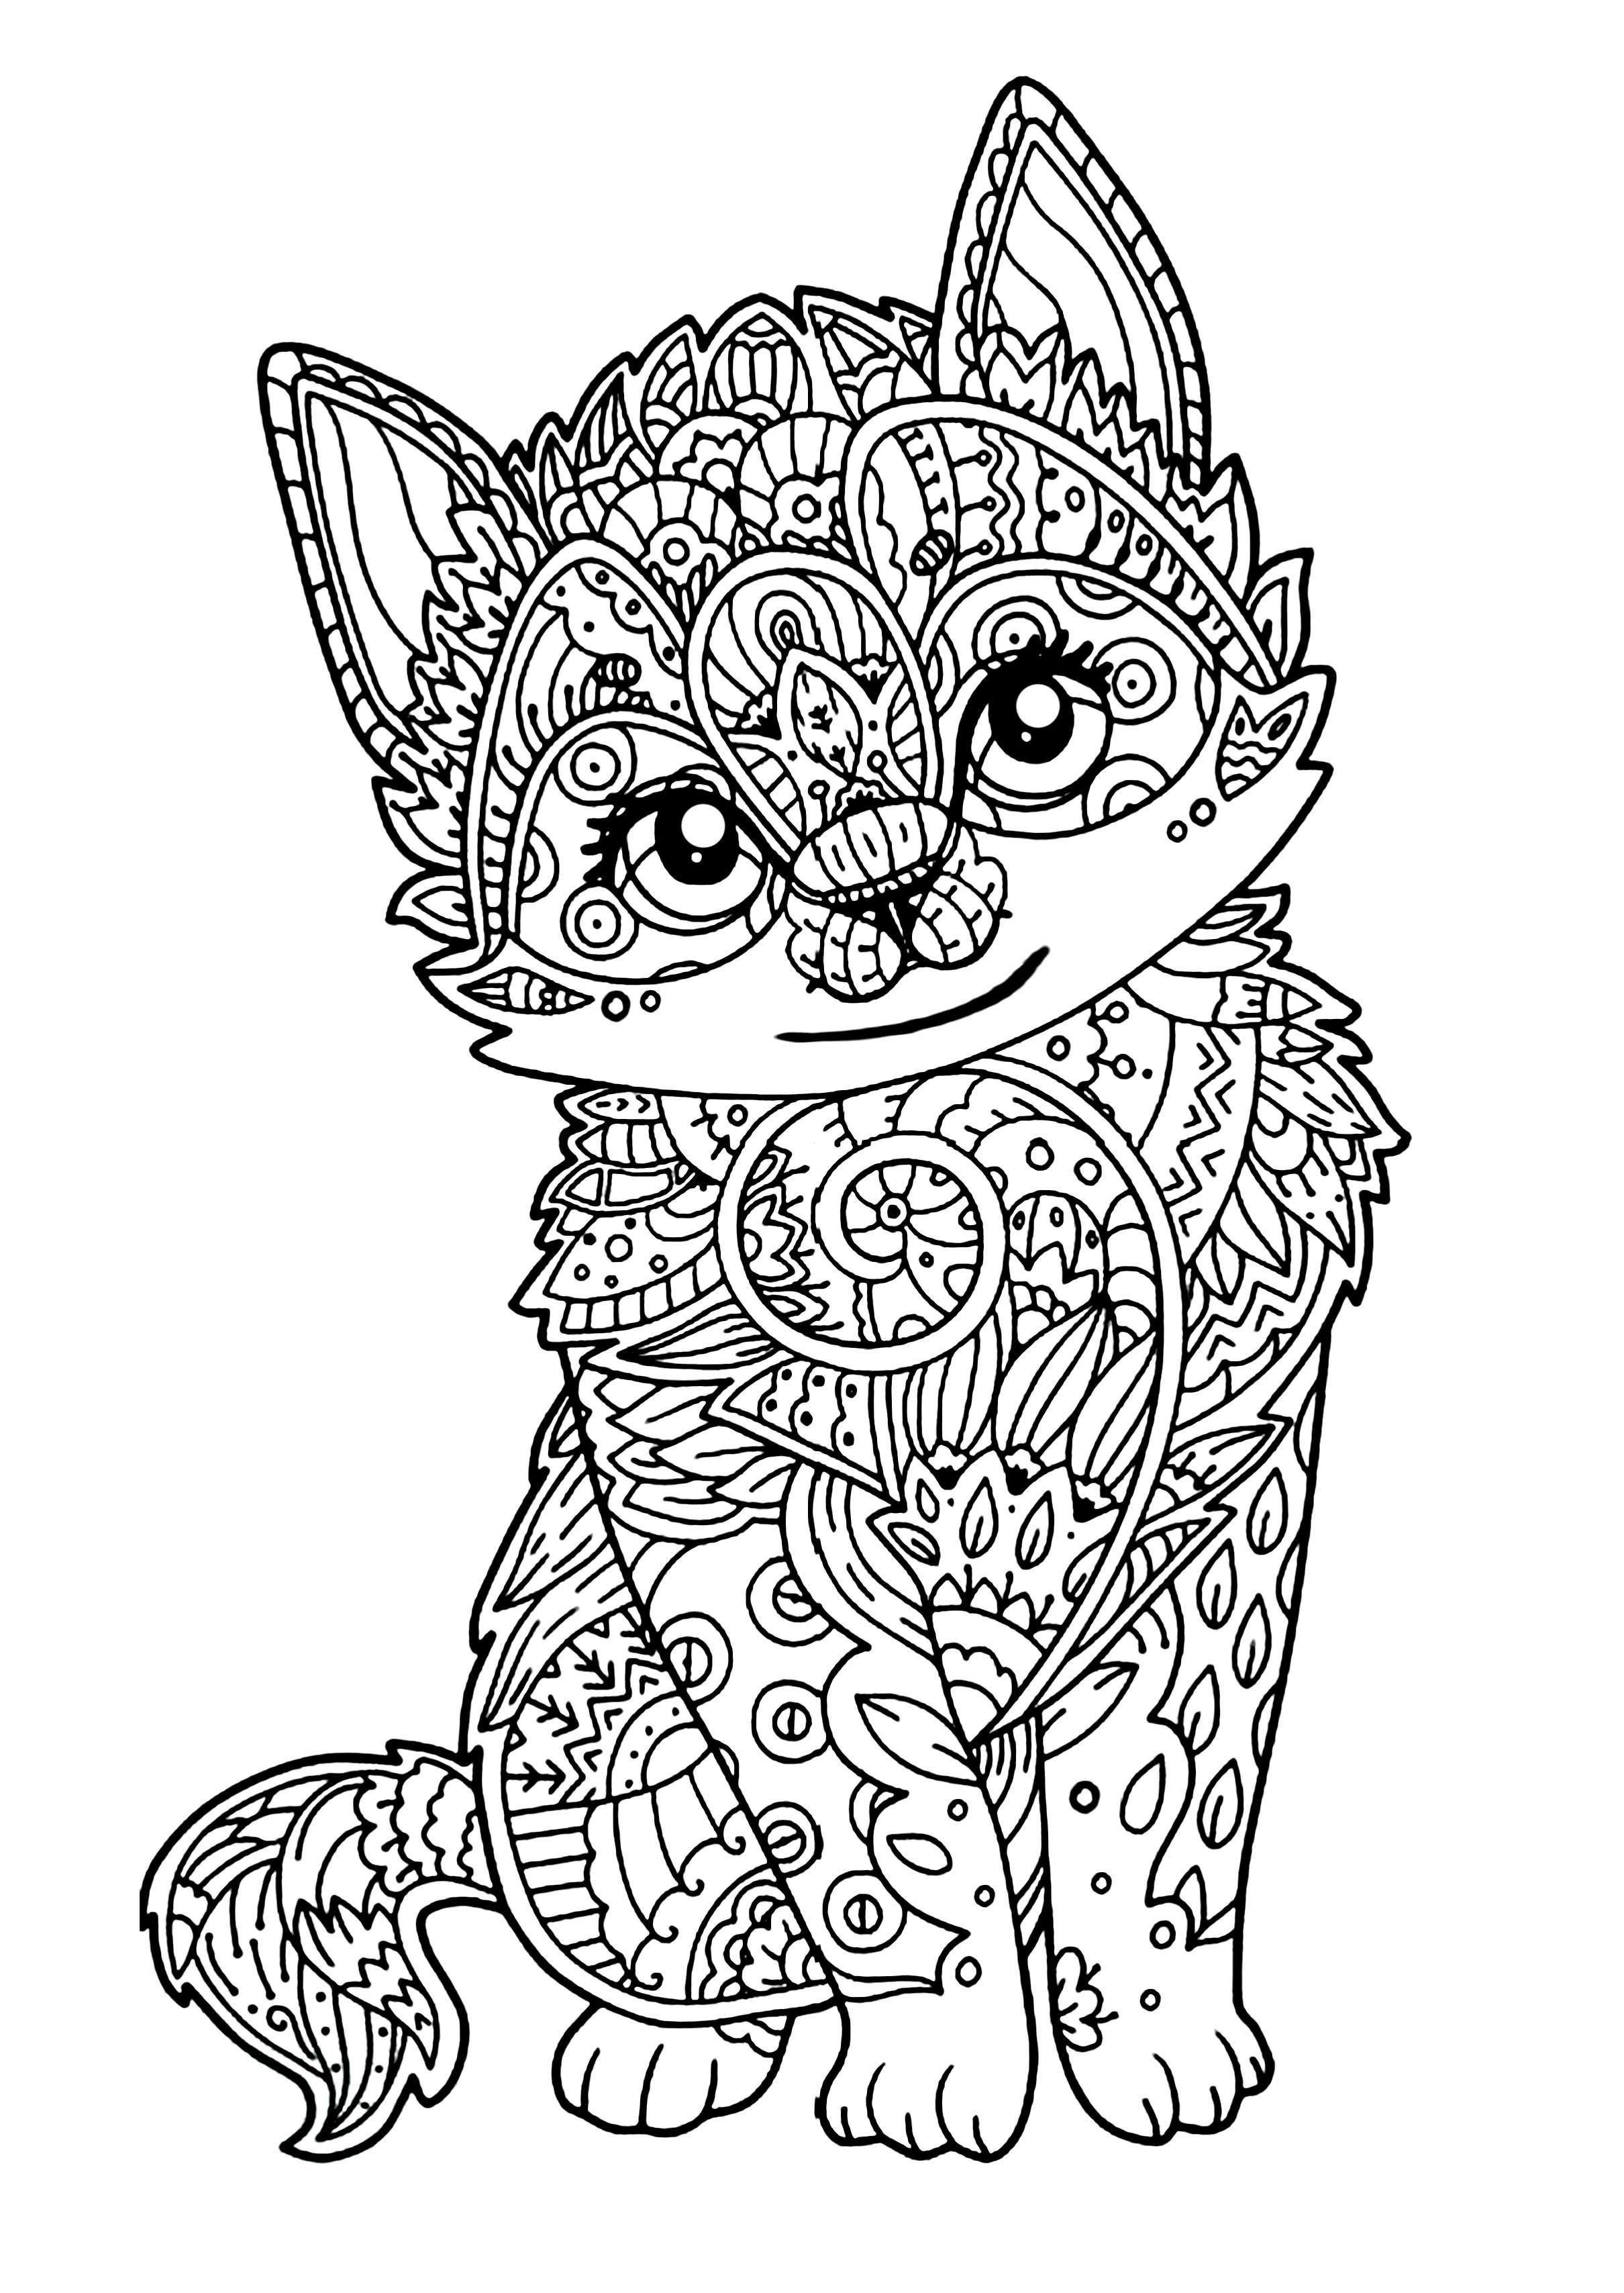 Coloring Mandala Cat Printllllll L Duilawyerlosangeles Kittens